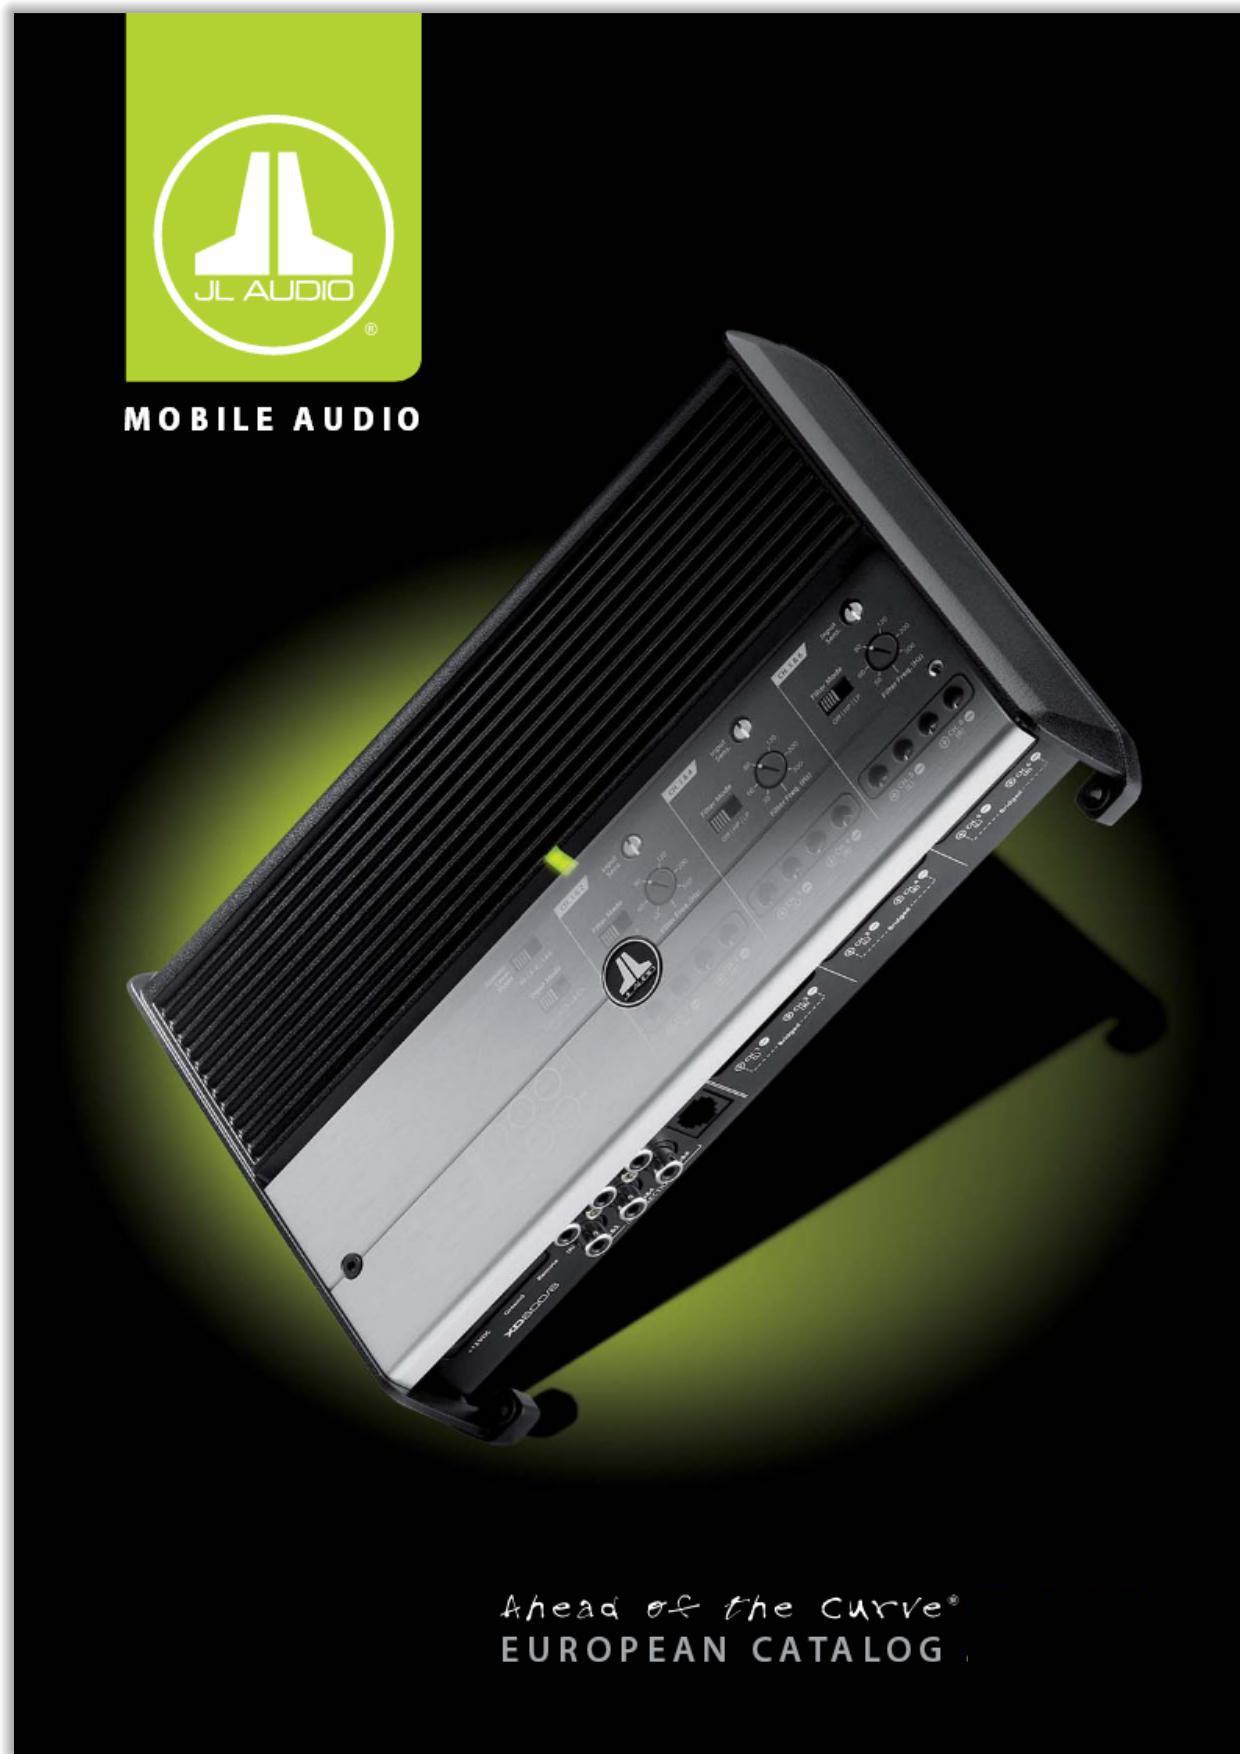 JL Audio Katalog